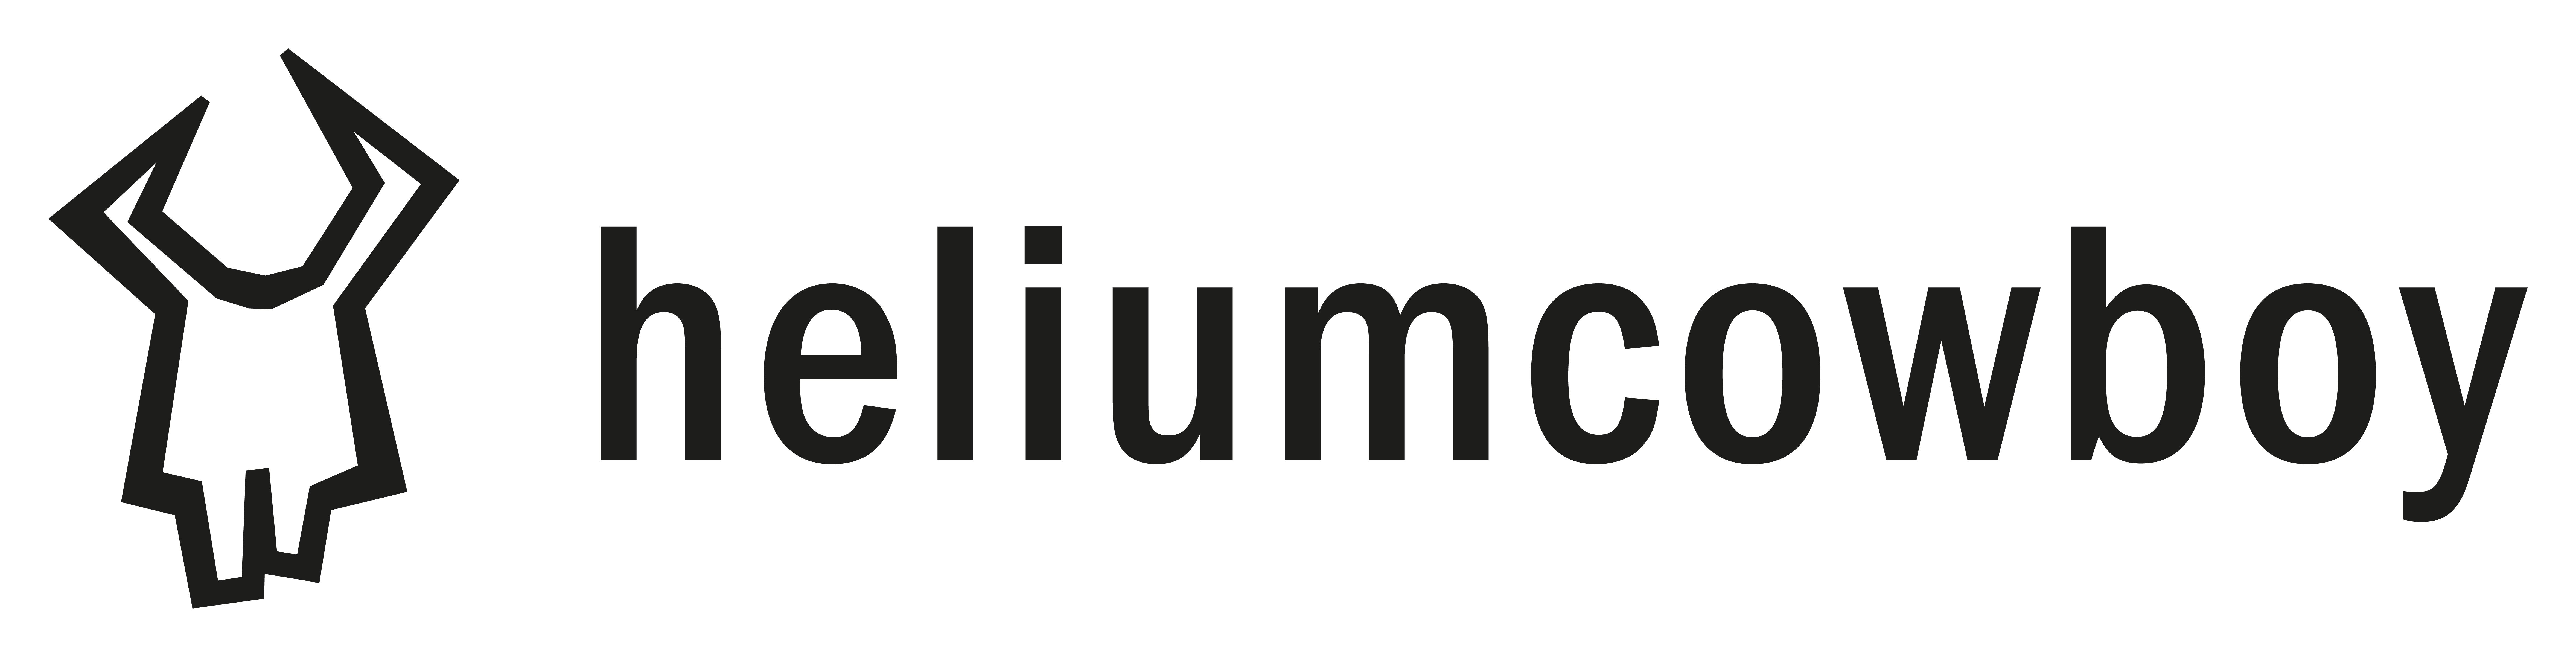 heliumcowboy company logo